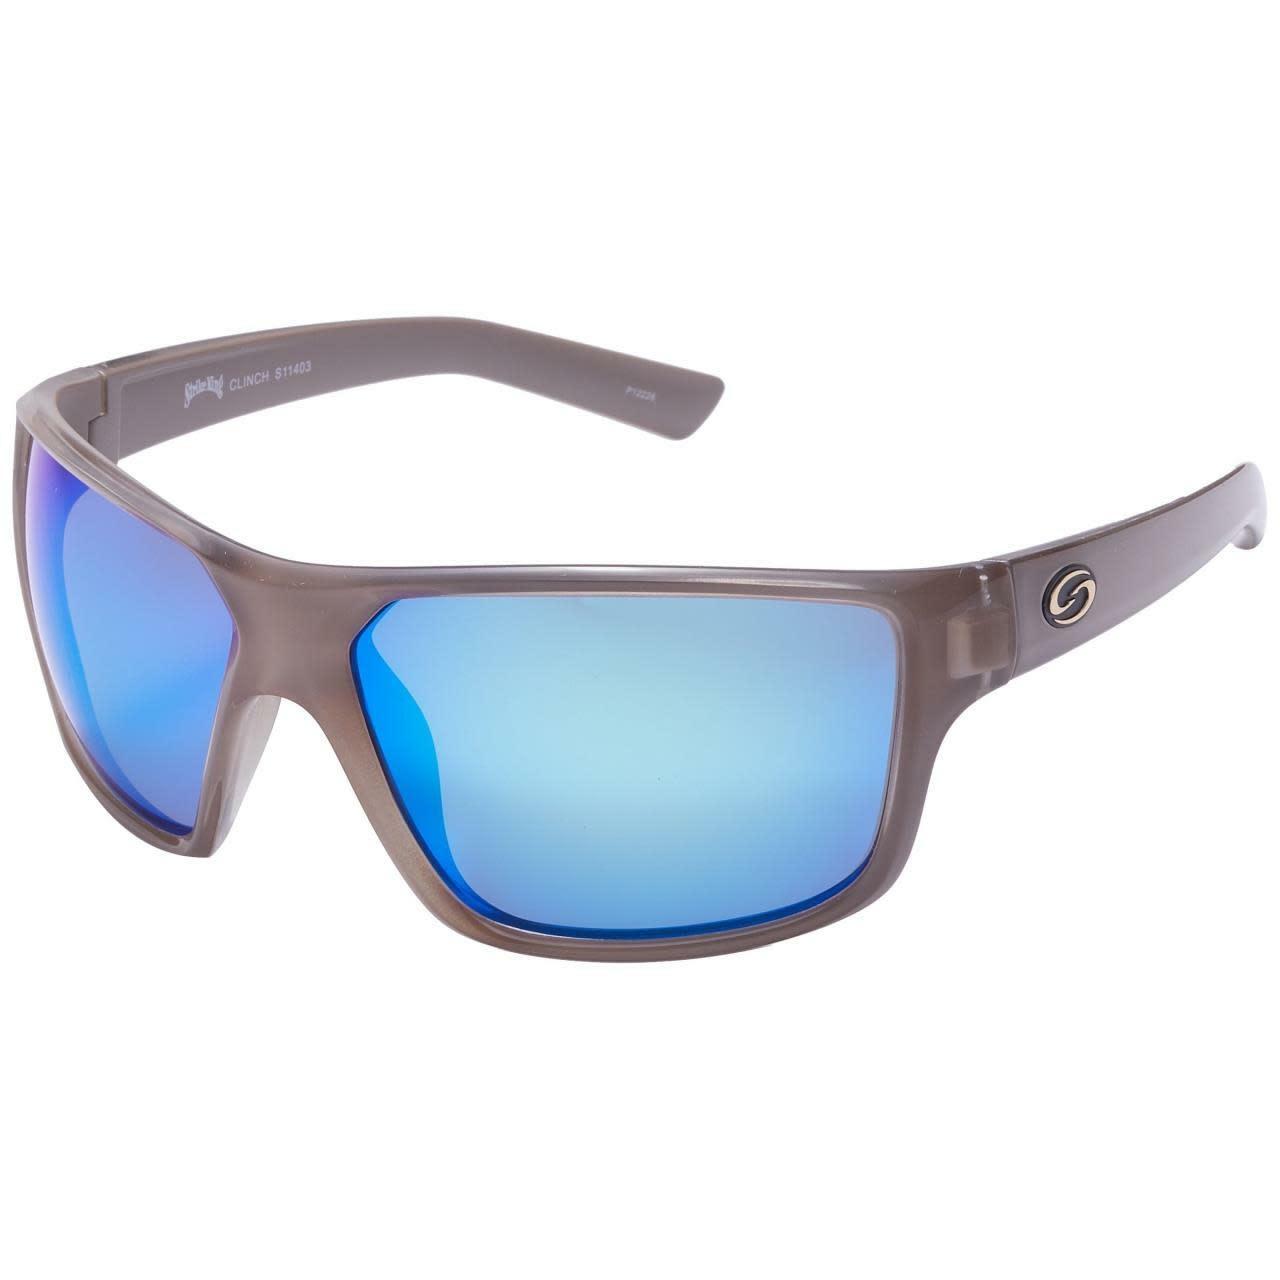 Strike King Strike King SG-S11403 S11 Optics Clinch Sunglasses Polarized, Crystal/White Blue Mirror